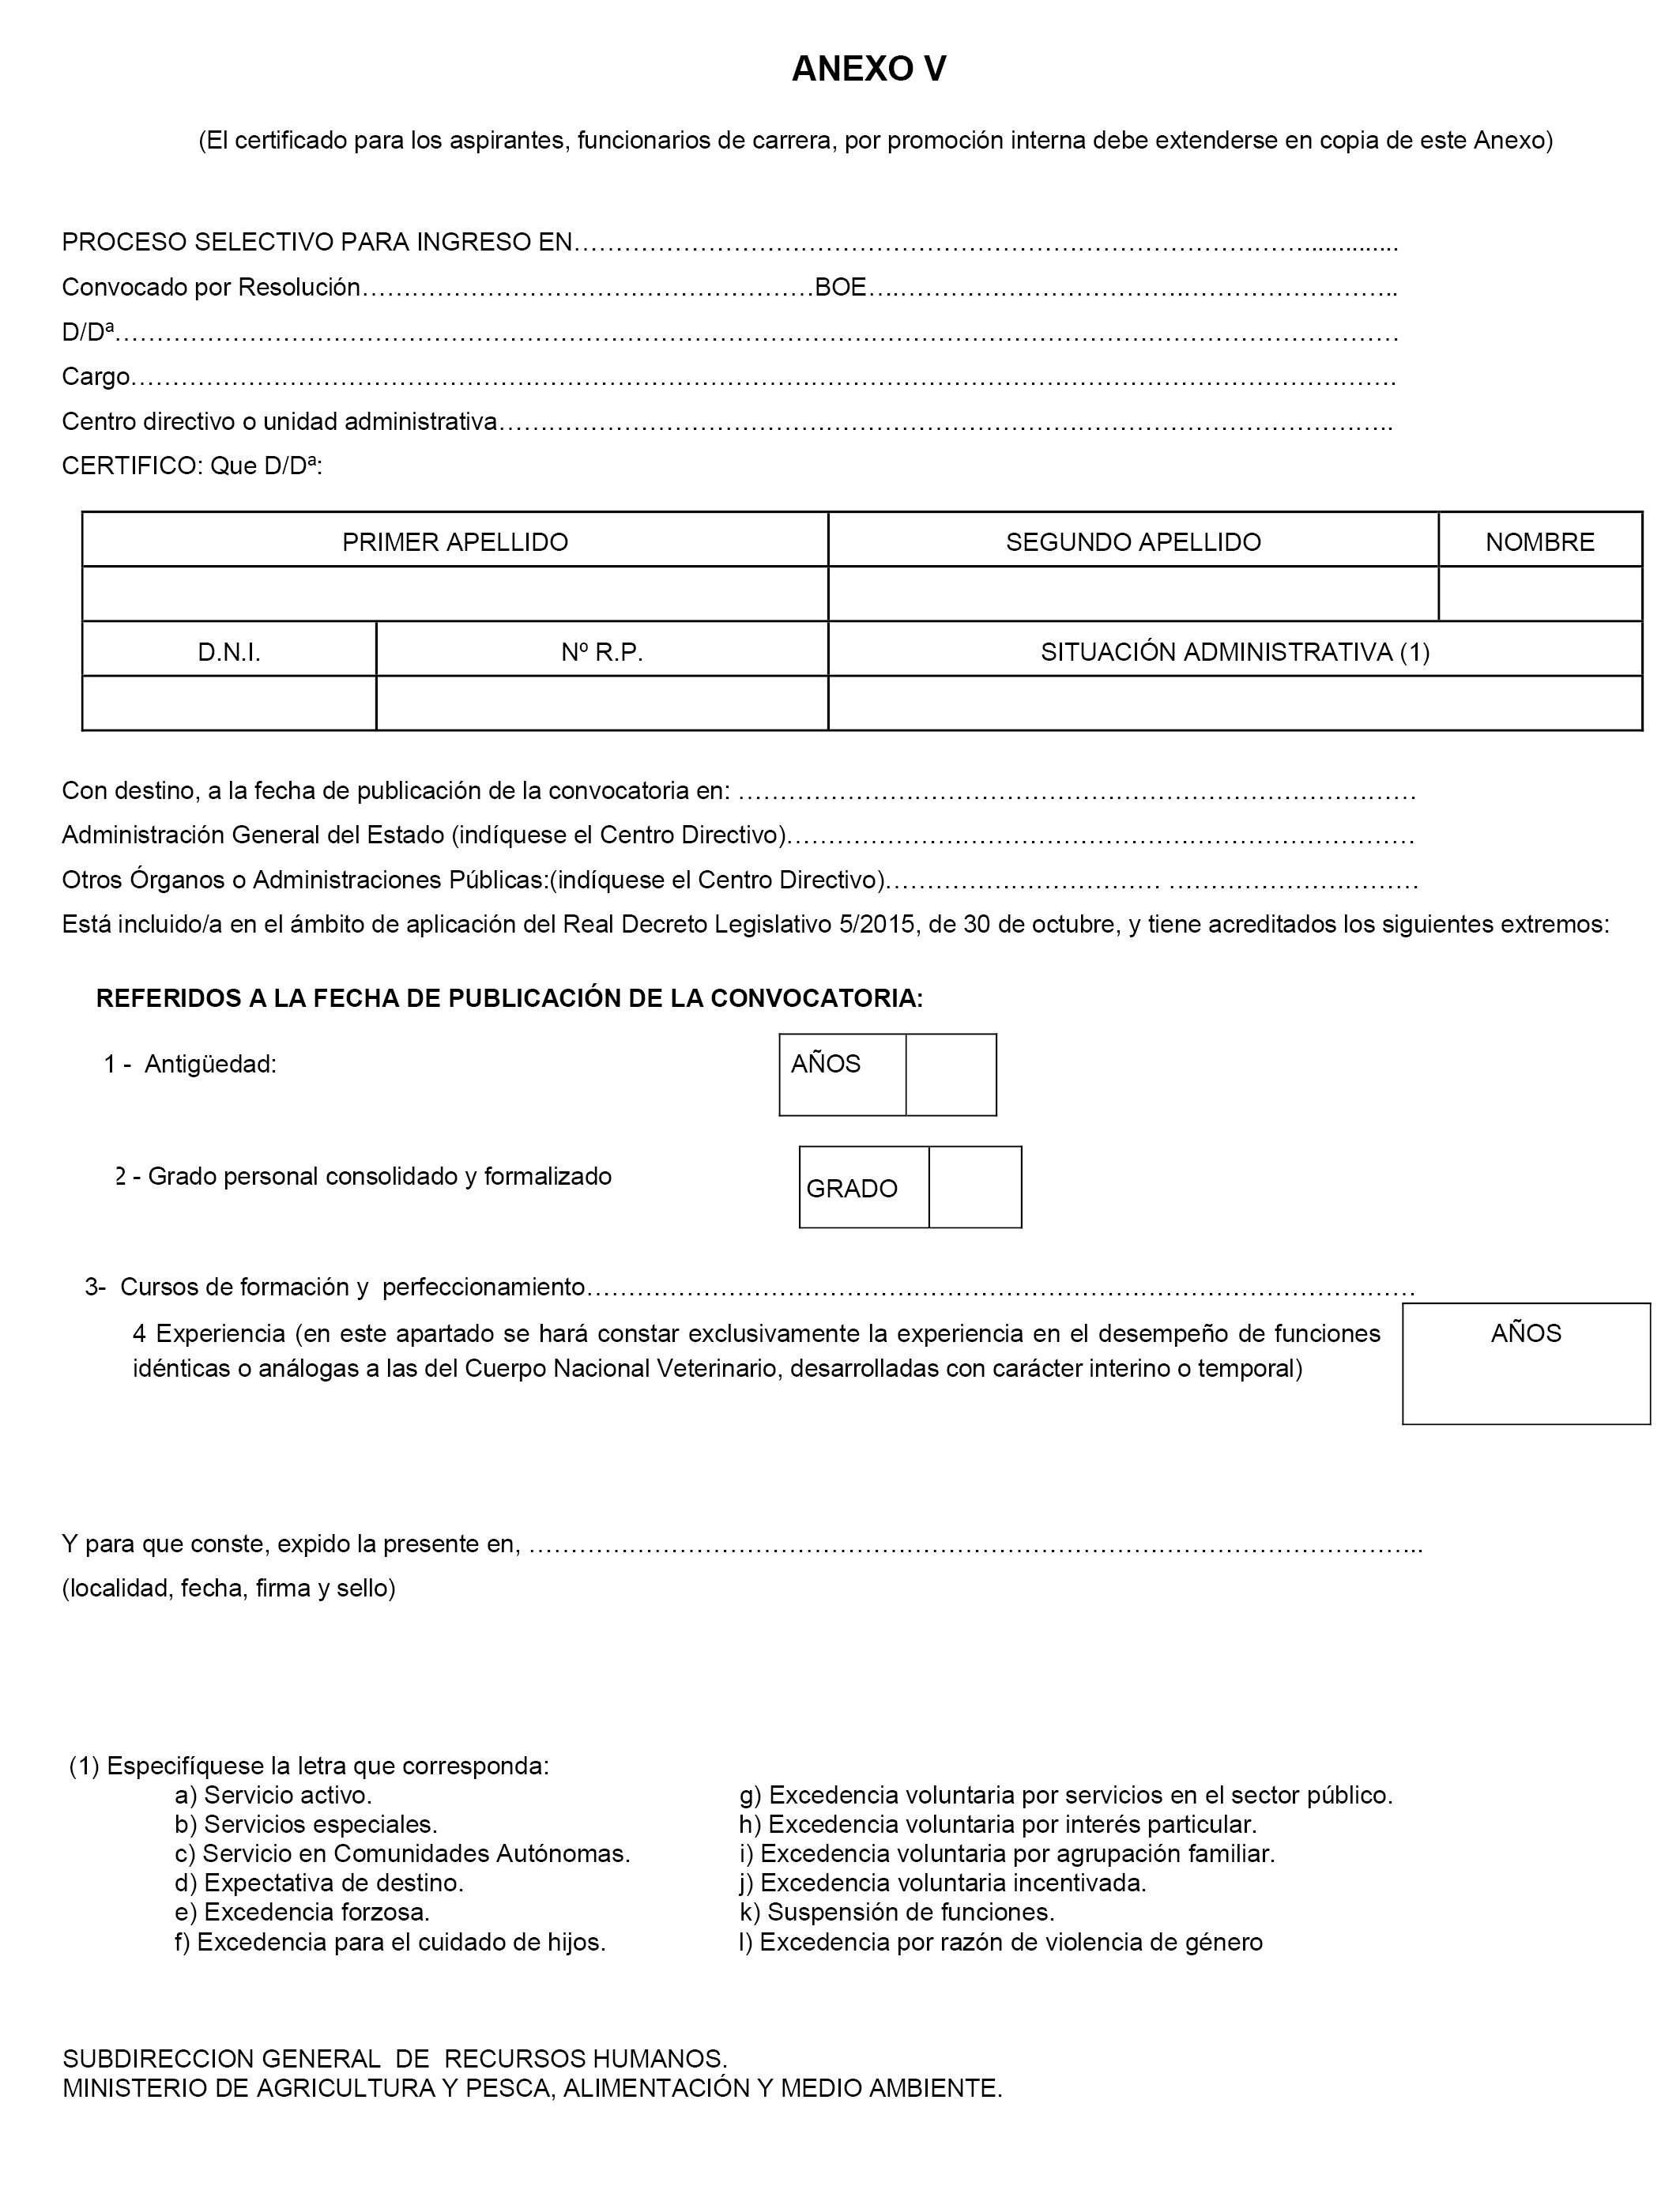 BOE.es - Documento BOE-A-2018-3059